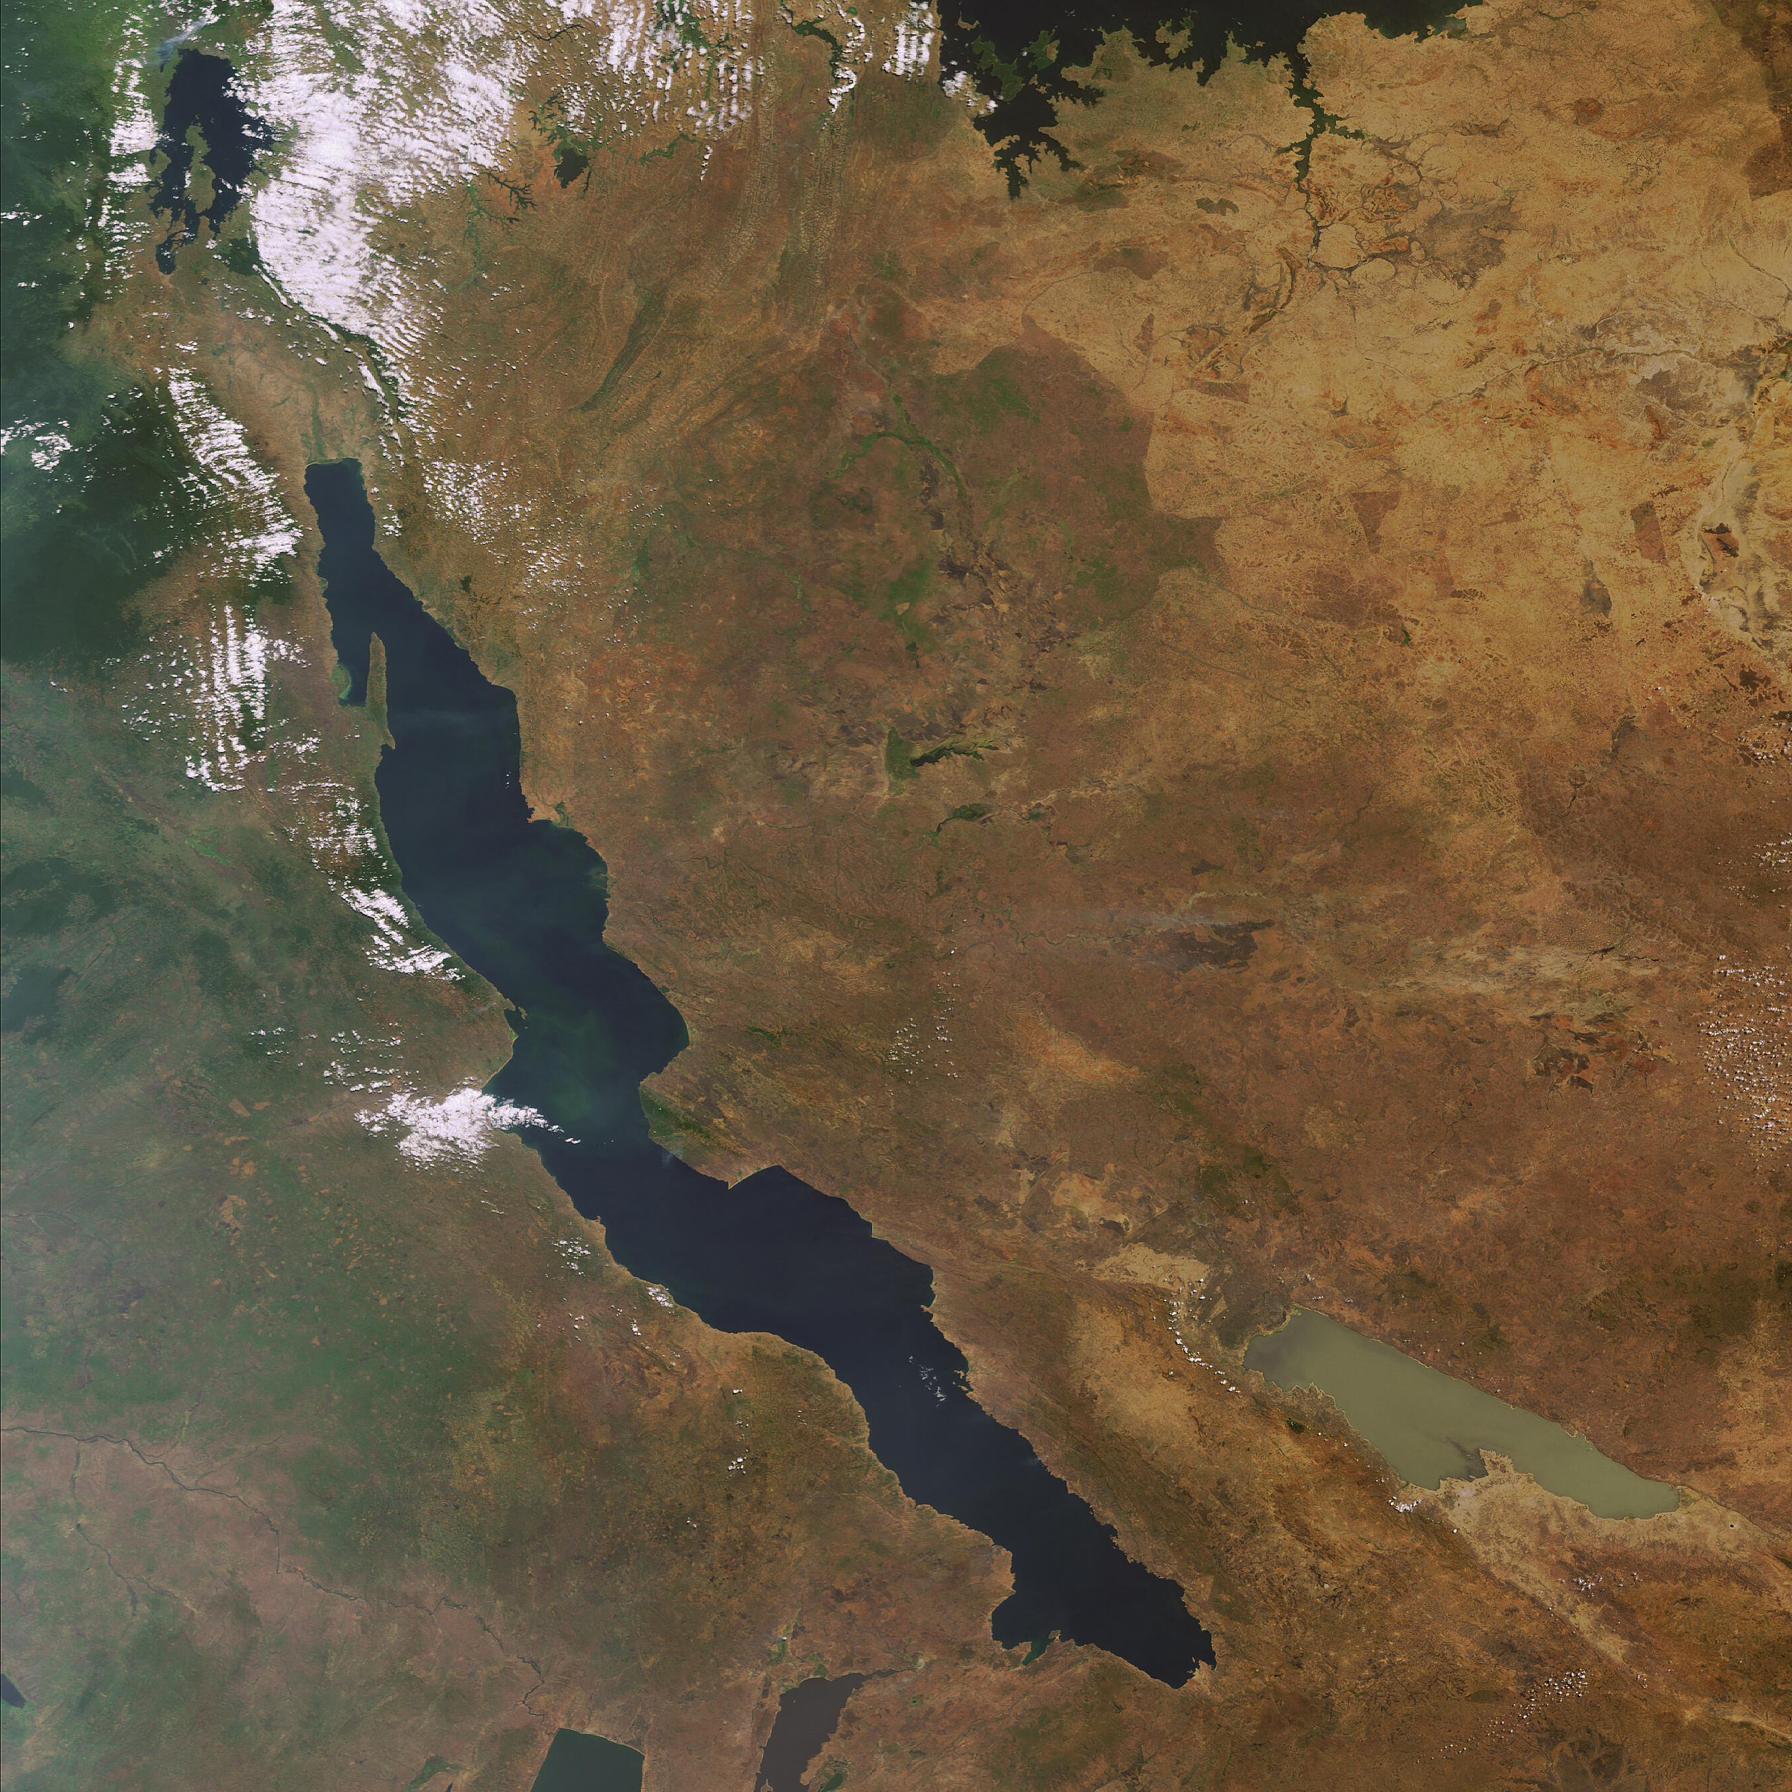 Space in Images - 2007 - 01 - Envisat sees Lake Tanganyika